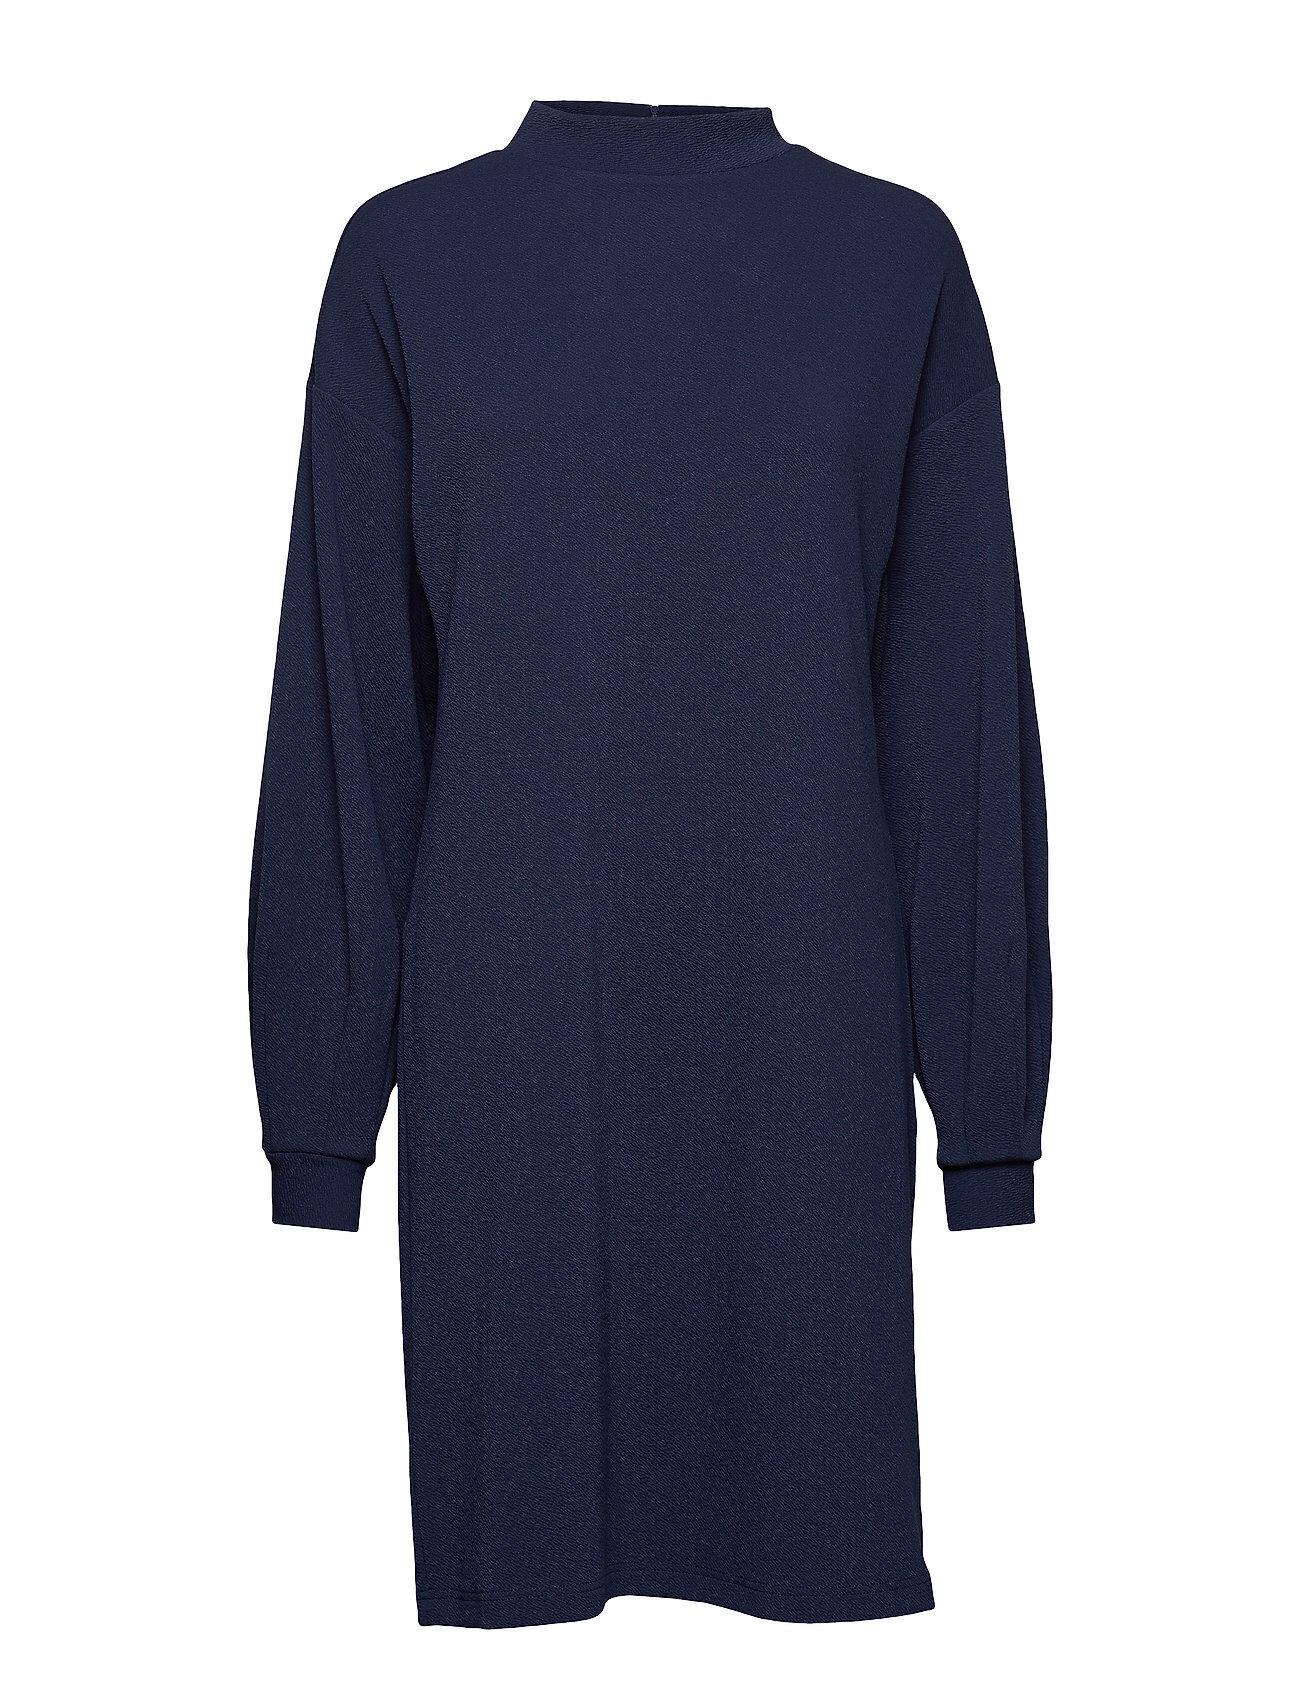 Minus Eleanor Dress